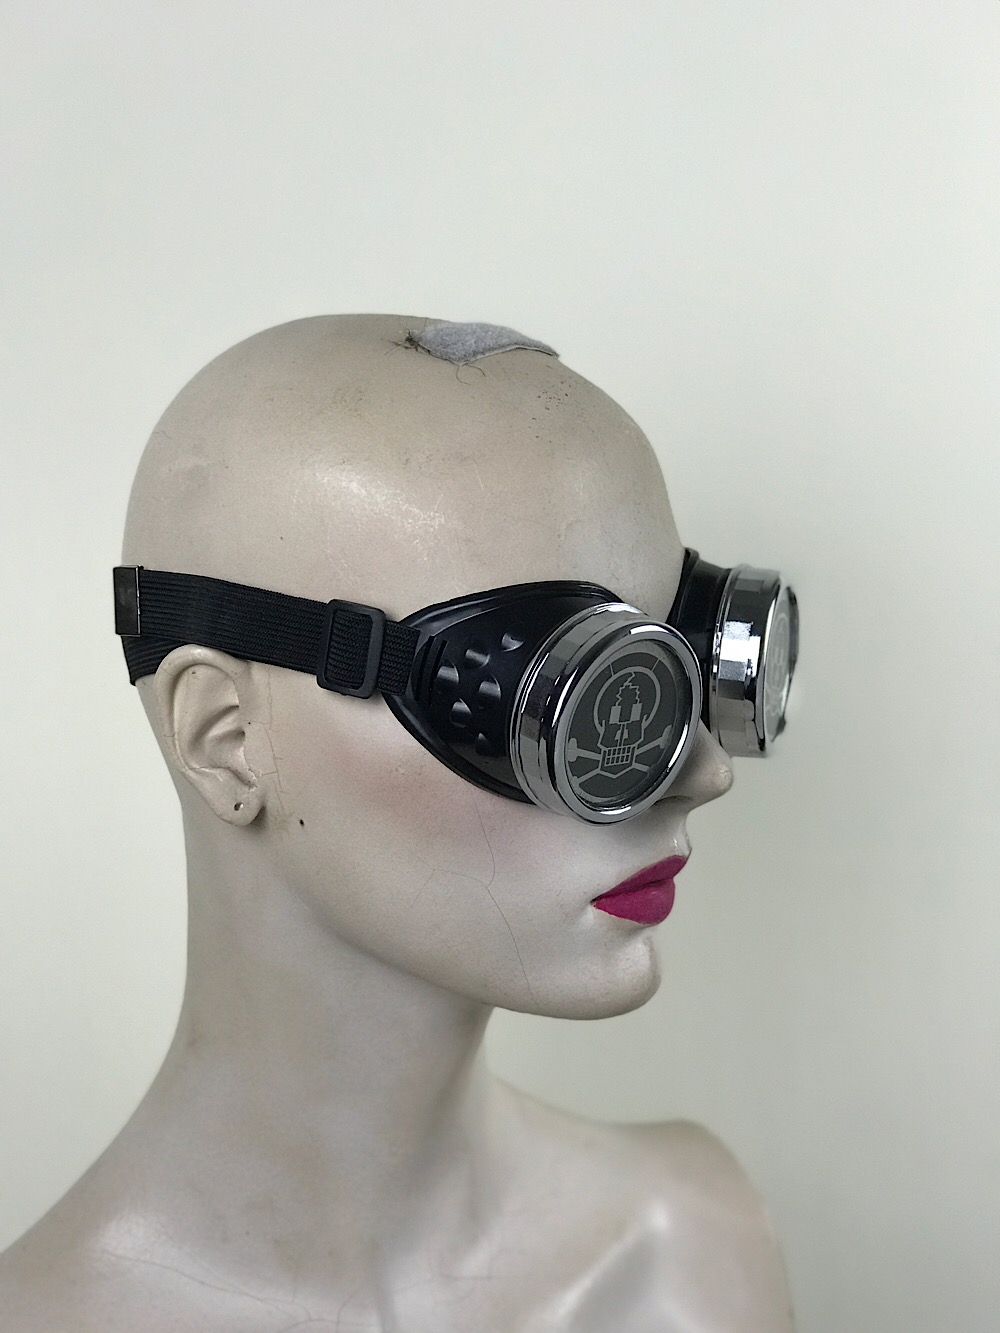 steampunk goggles metal ocular lens silver plastic cups SKULL